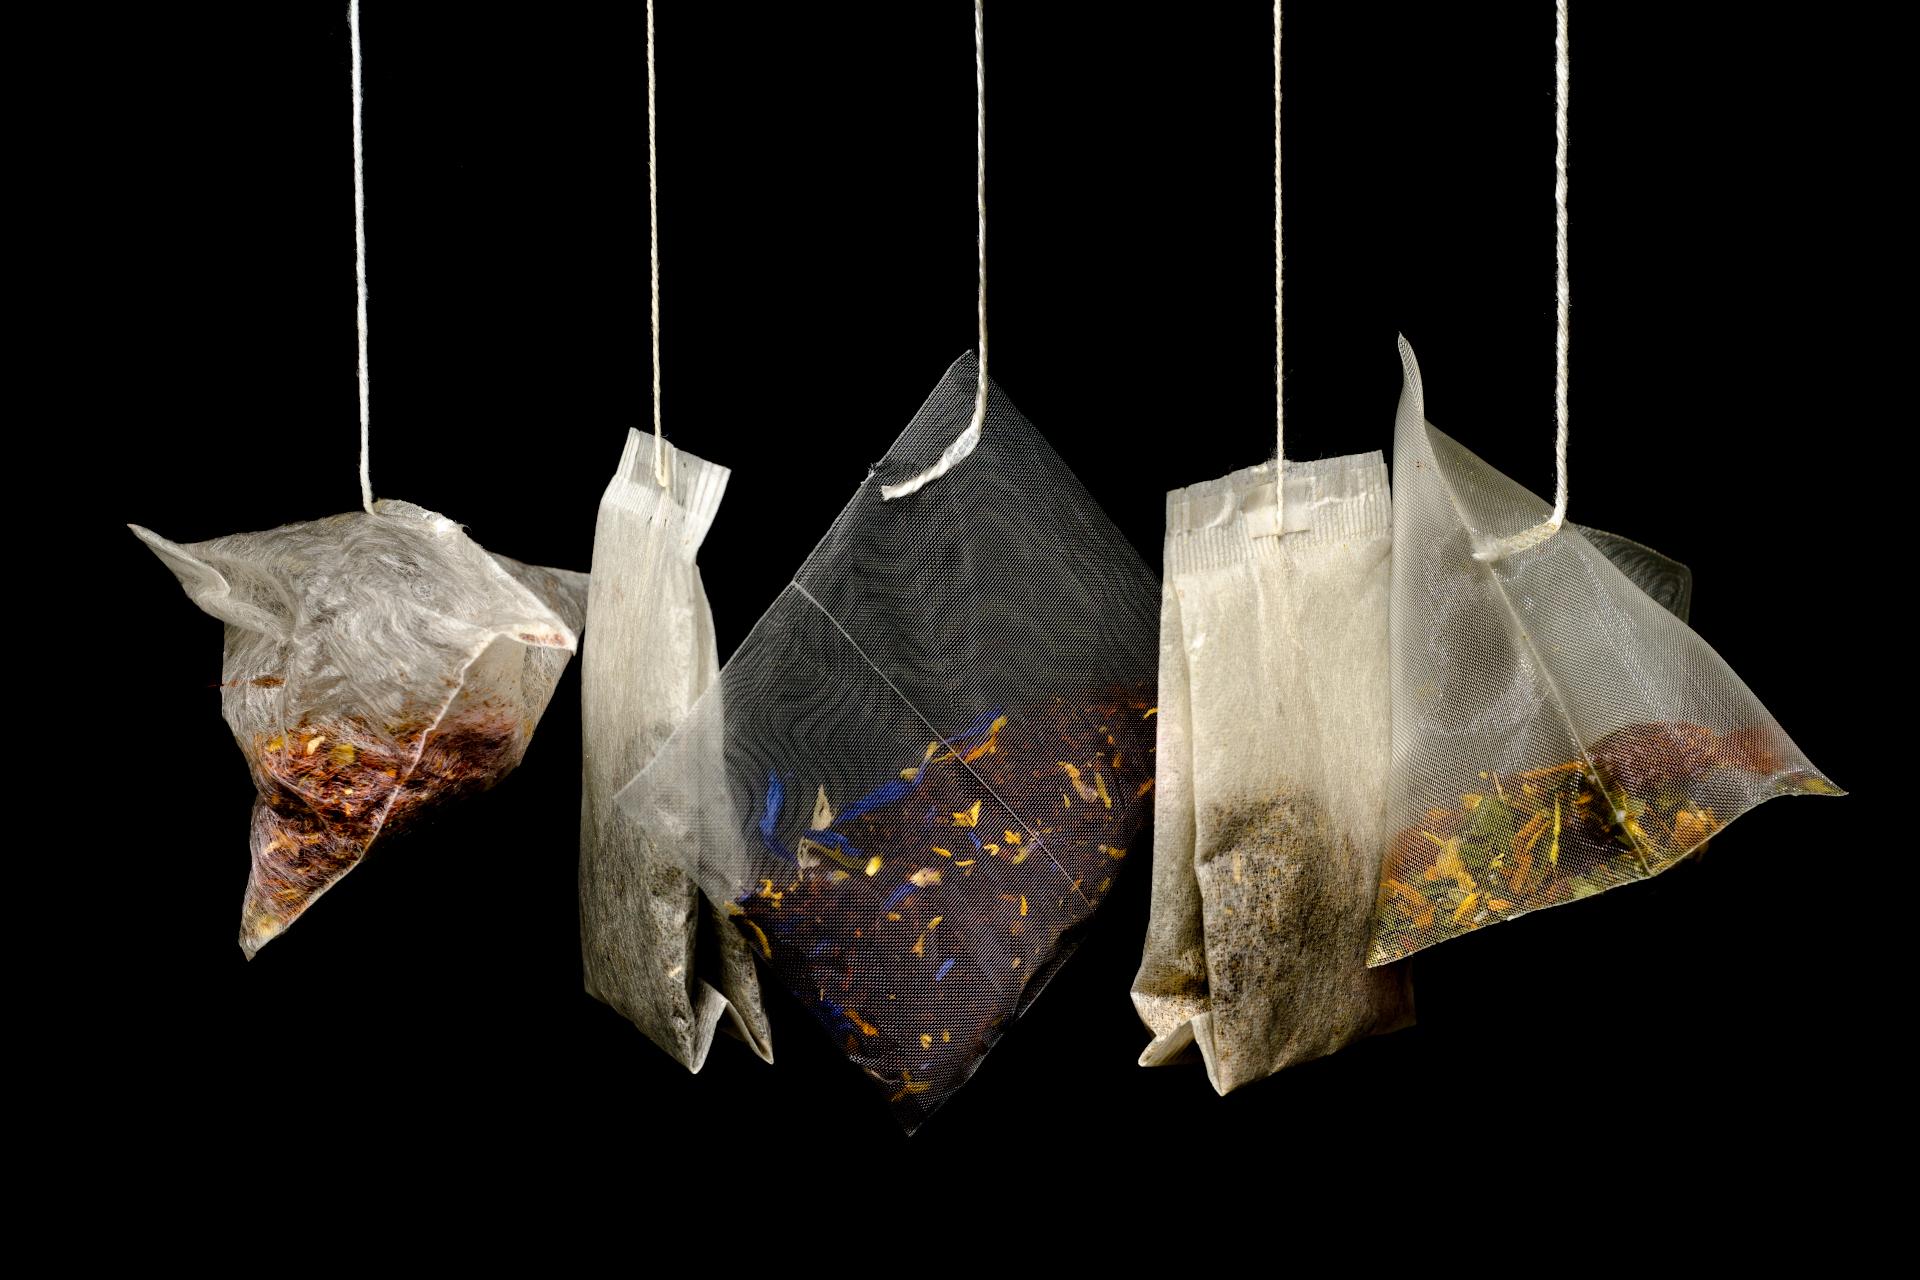 Hanging tea bags